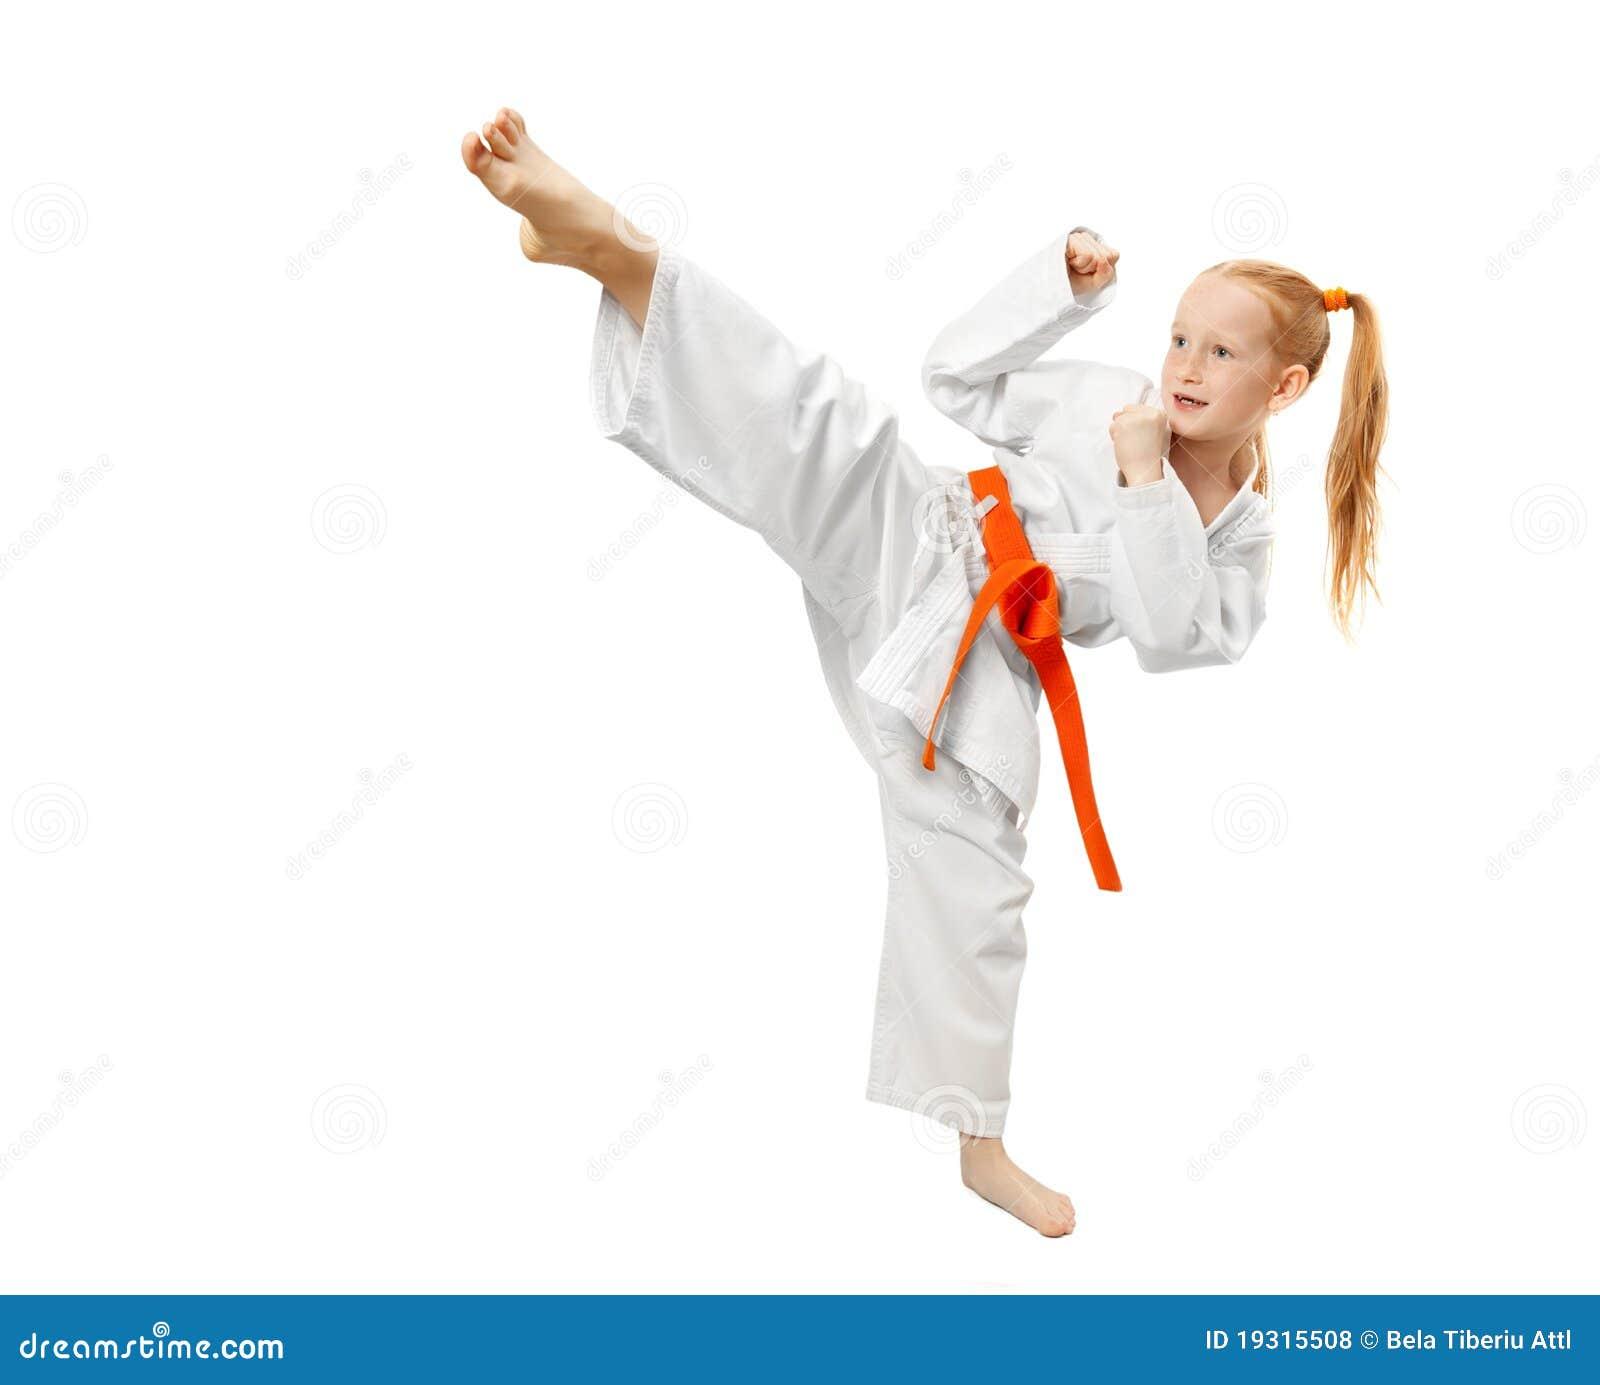 Martial Arts Girl Royalty Free Stock Photos Image 19315508